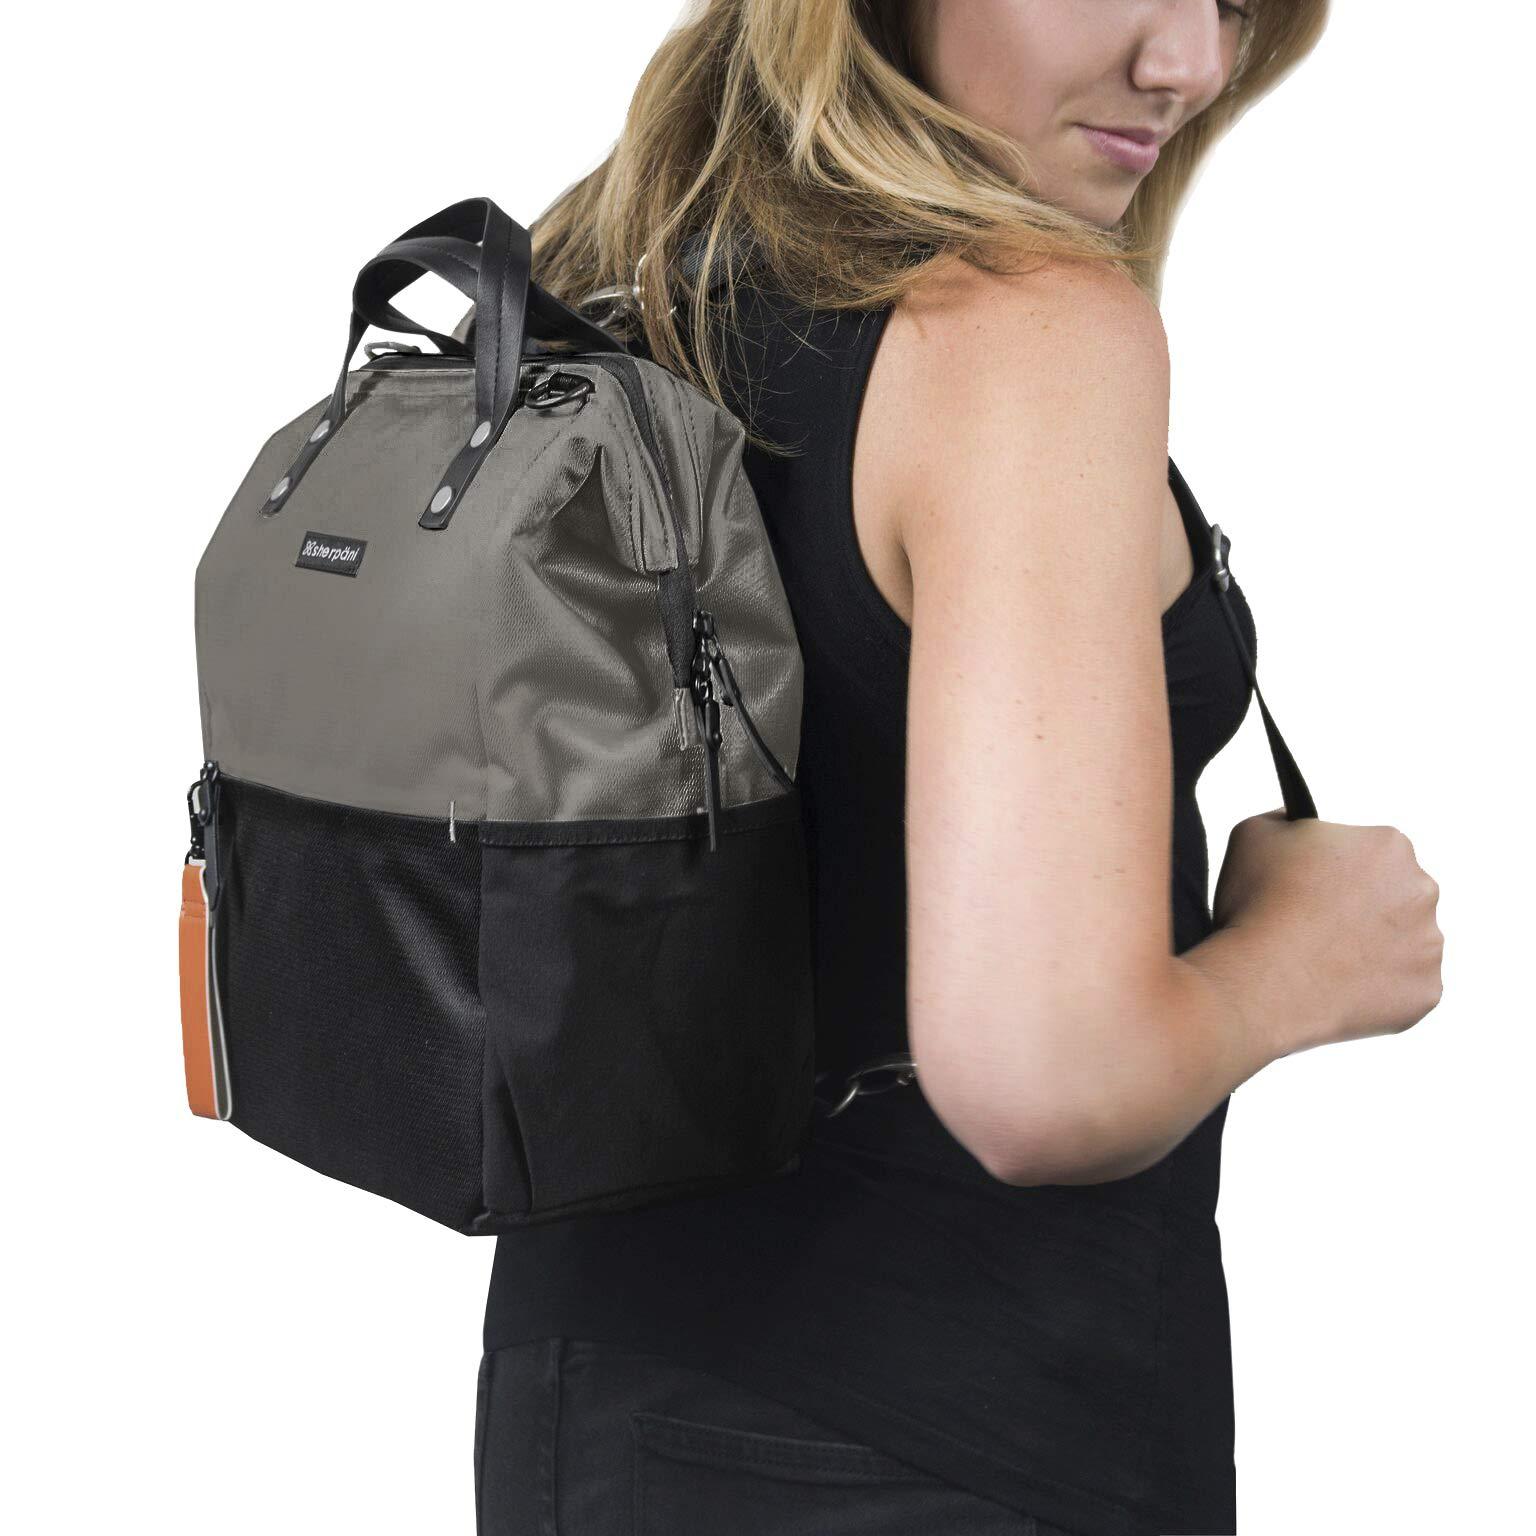 Sherpani Women's 18-dispa-04-11-0 Travel Cross-Body Bag, Flint, One Size by Sherpani (Image #5)